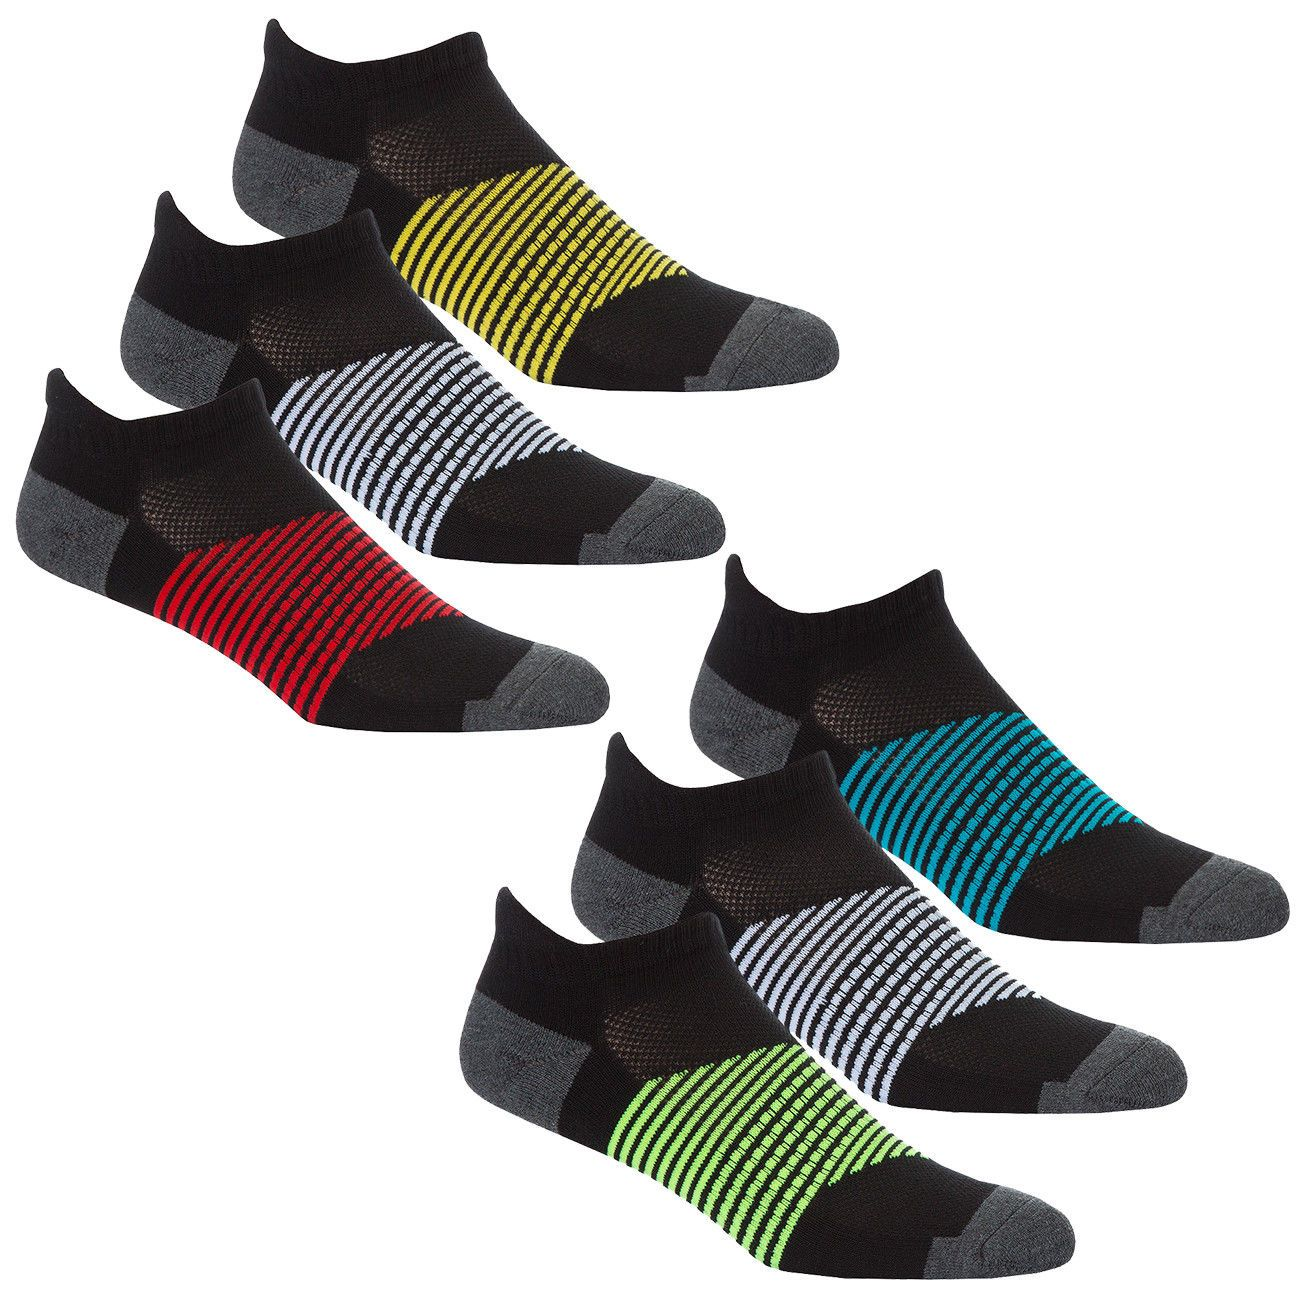 adidas trainer socks mens 6-11